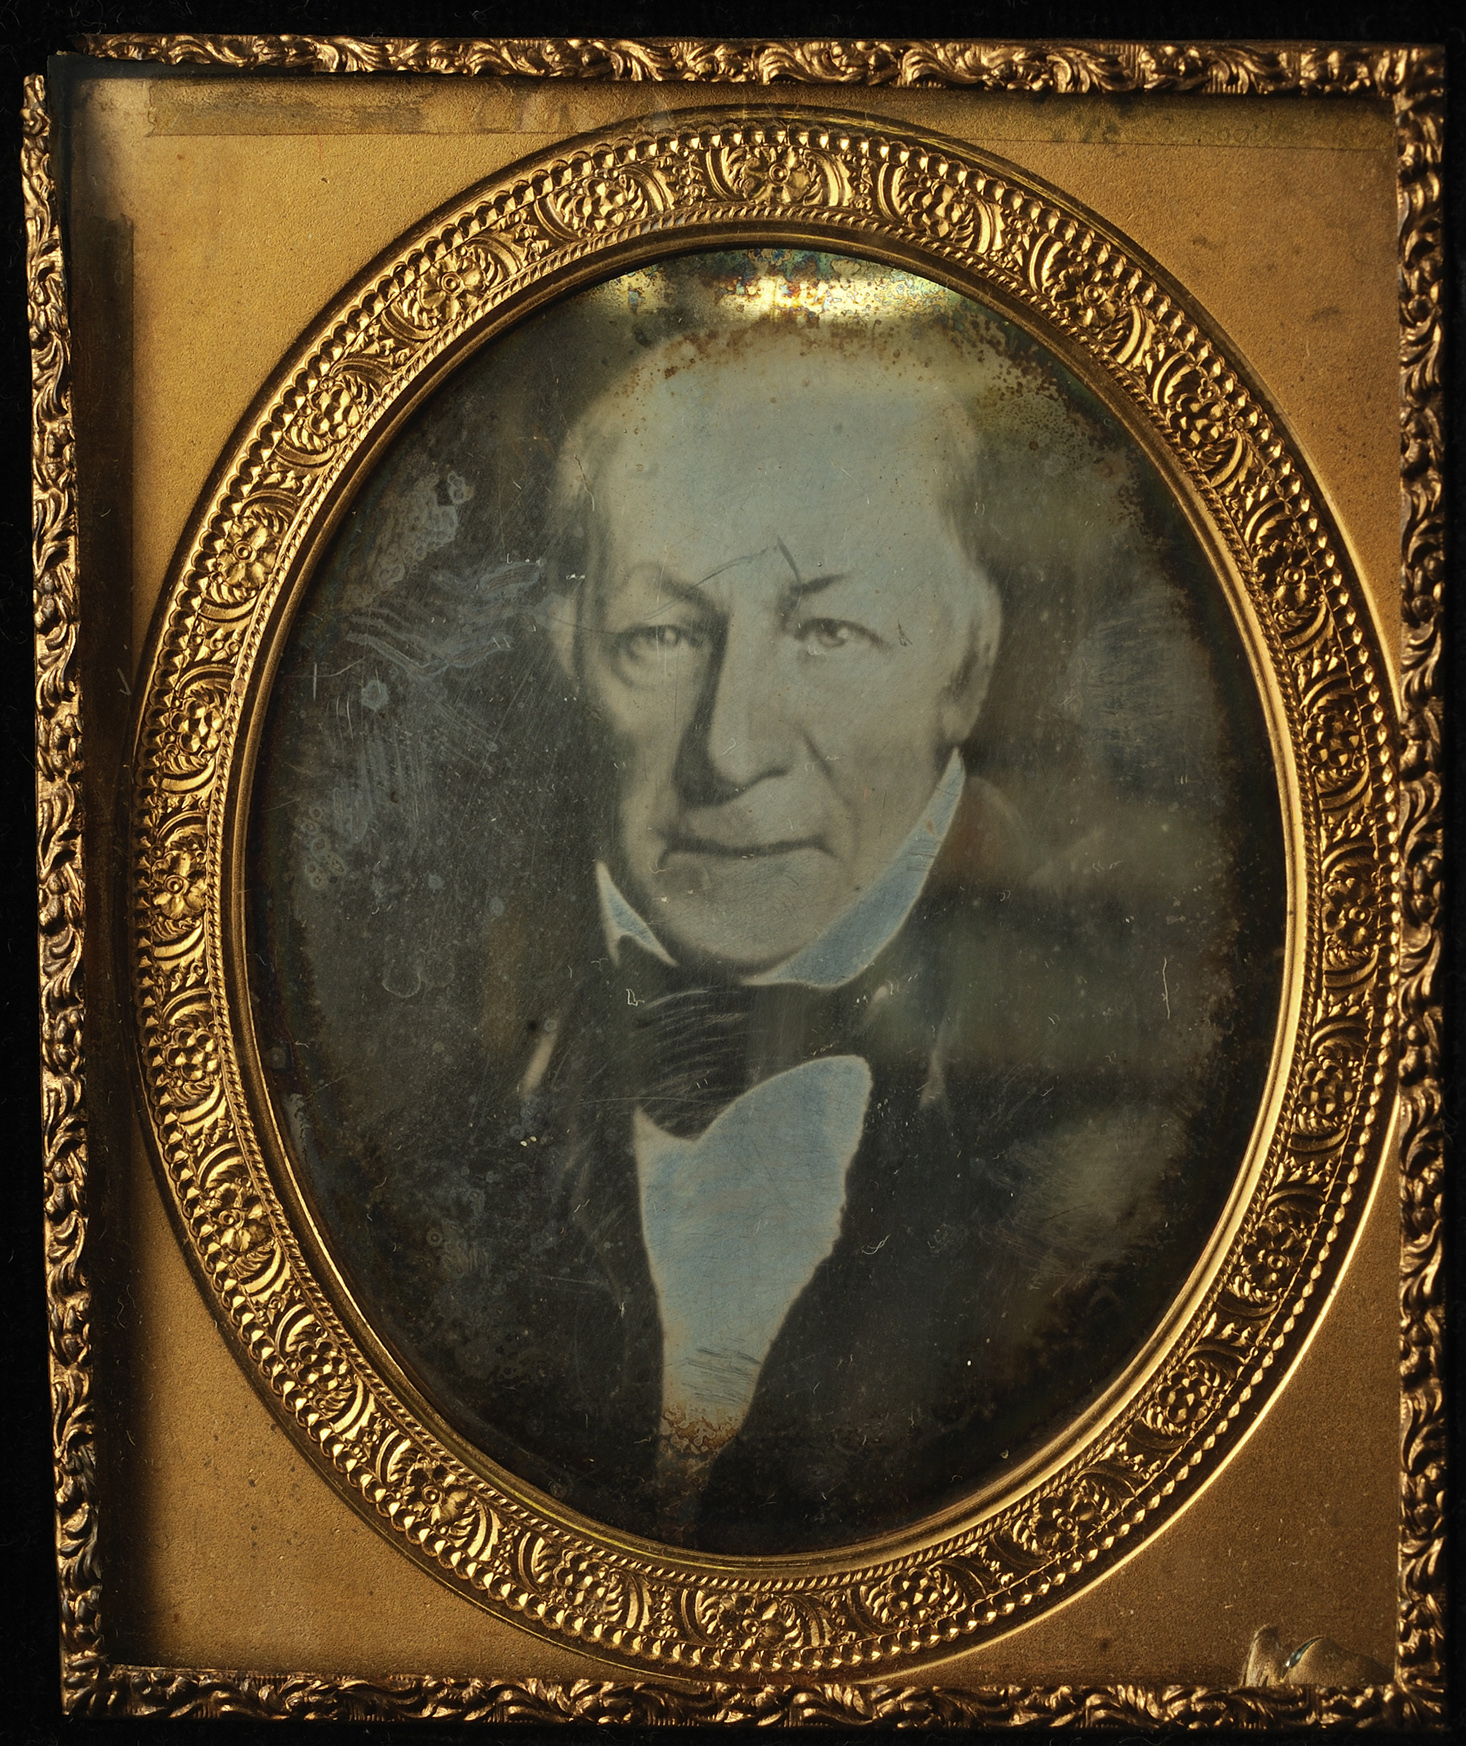 Daguerreotype of a portrait of John Richard Watrous, American, Mid-19th century